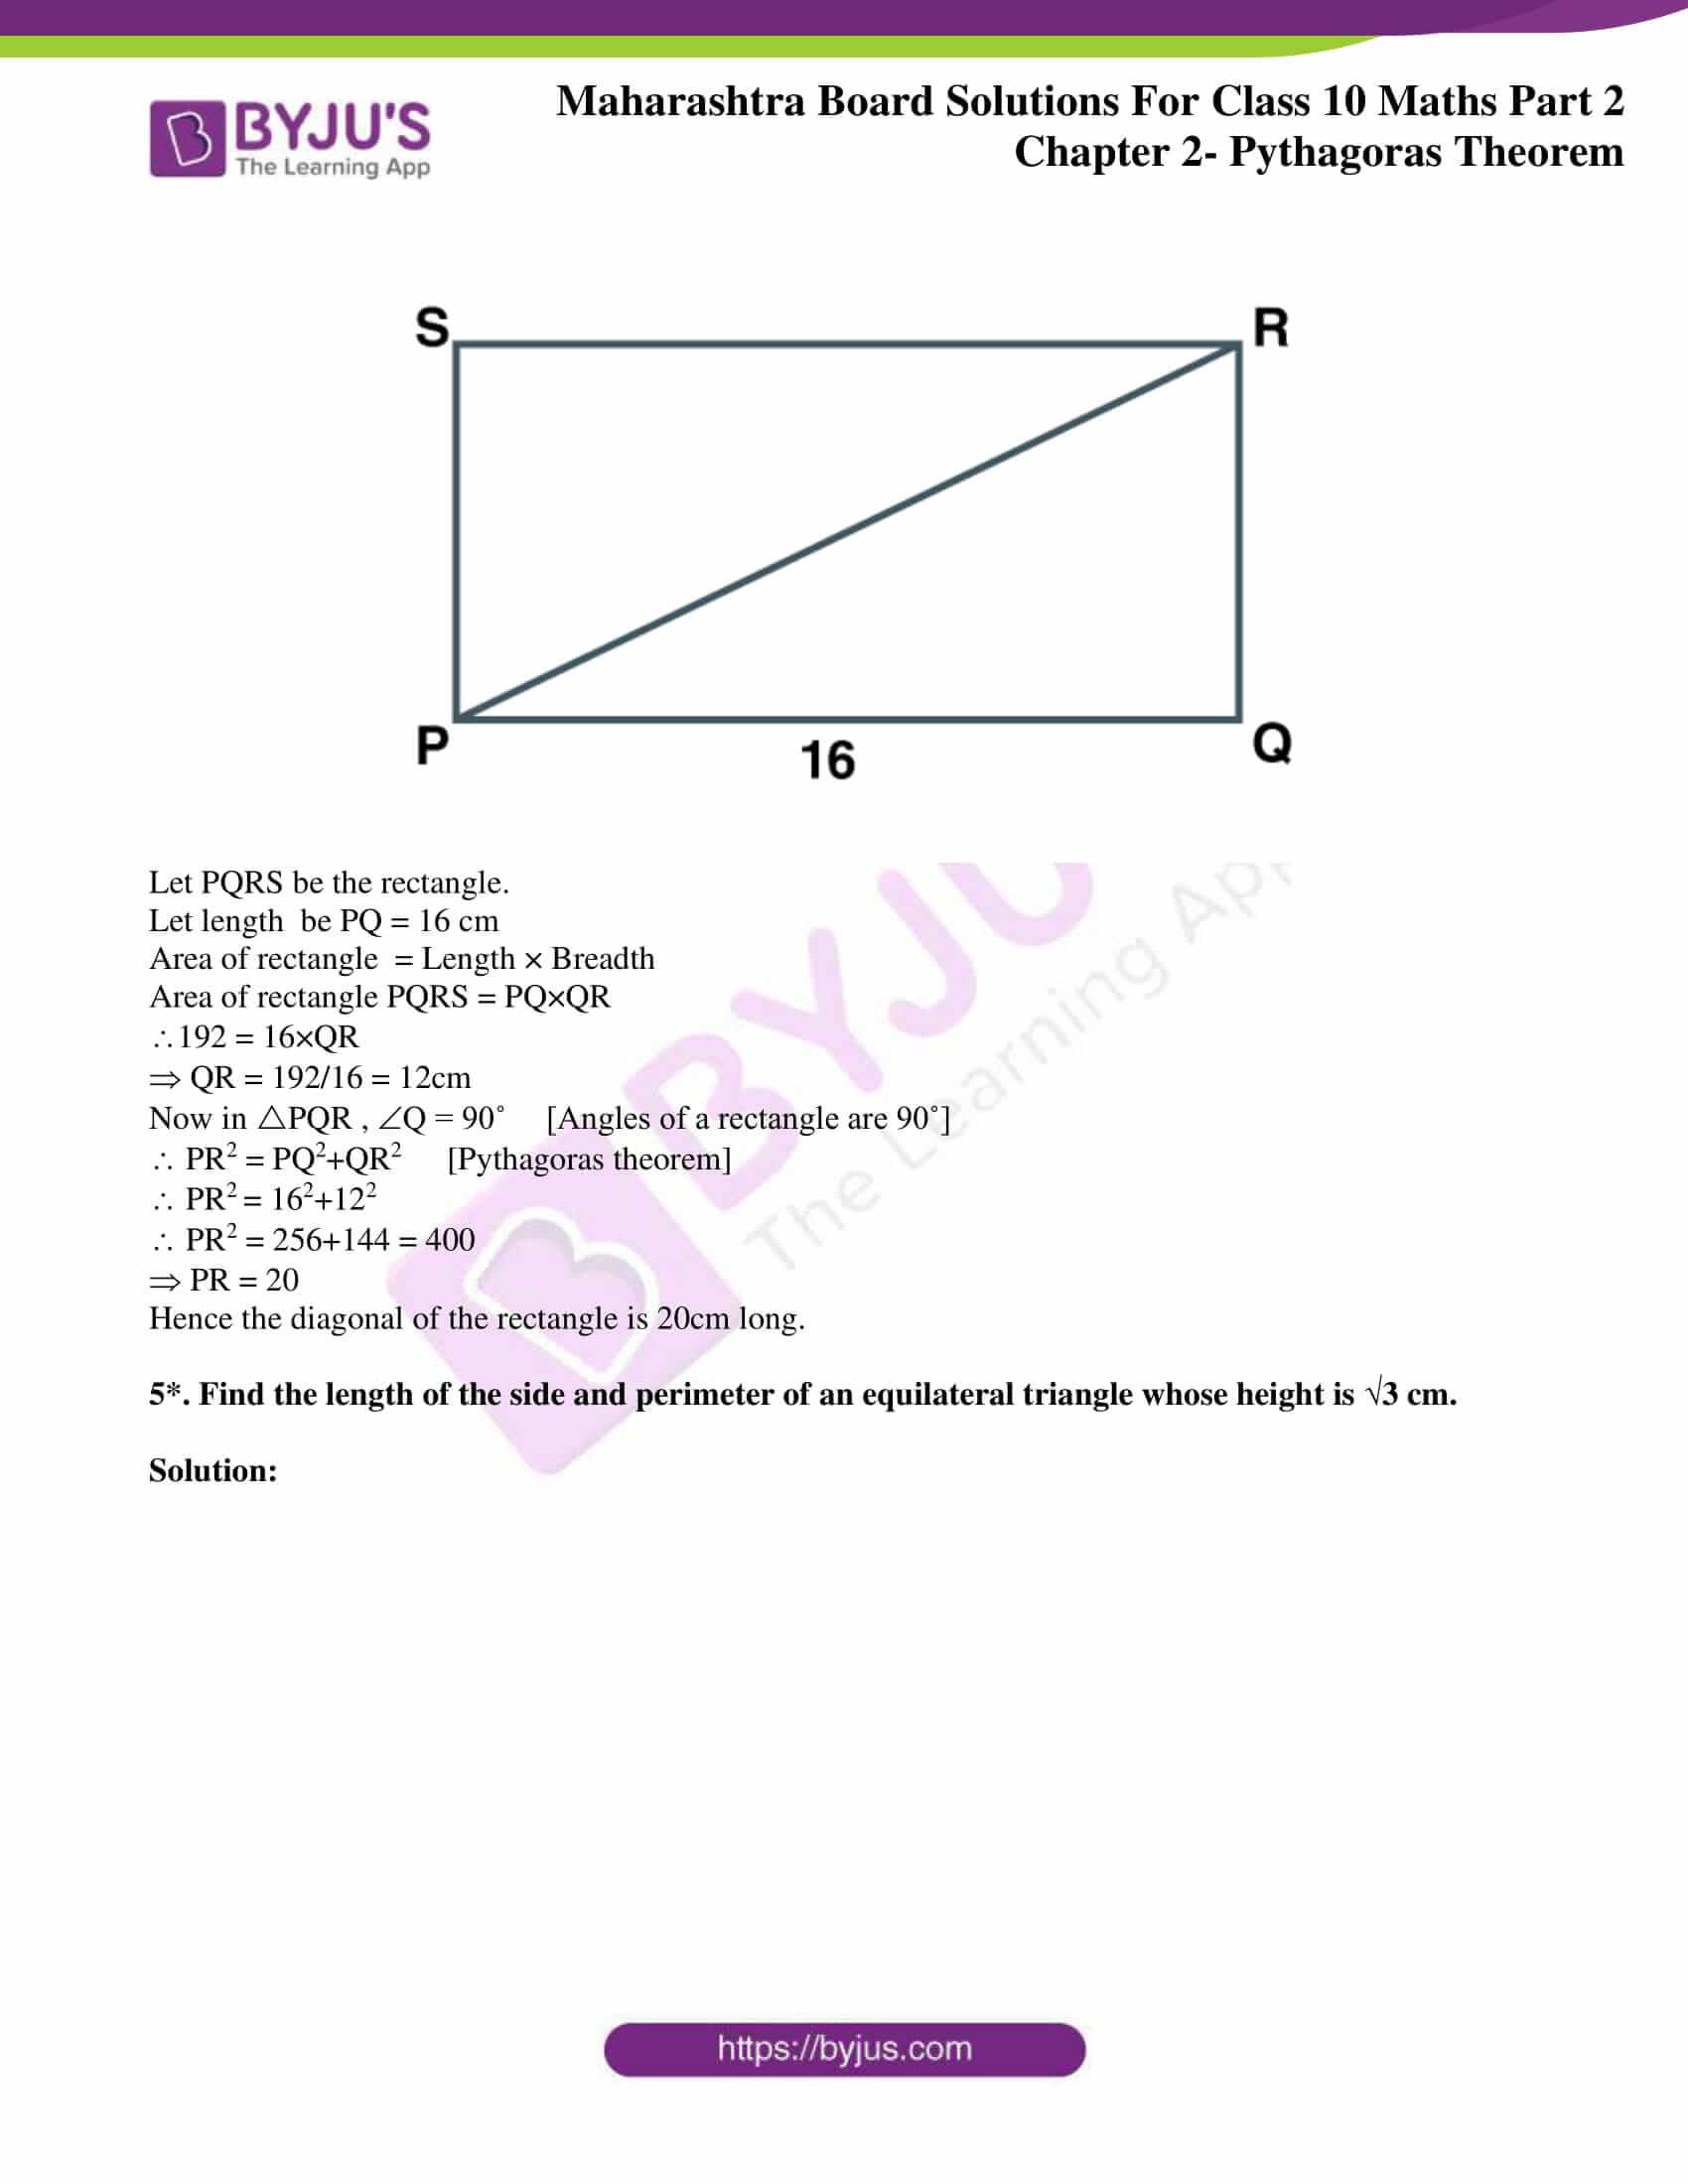 msbshse sol class 10 maths part 2 chapter 2 11